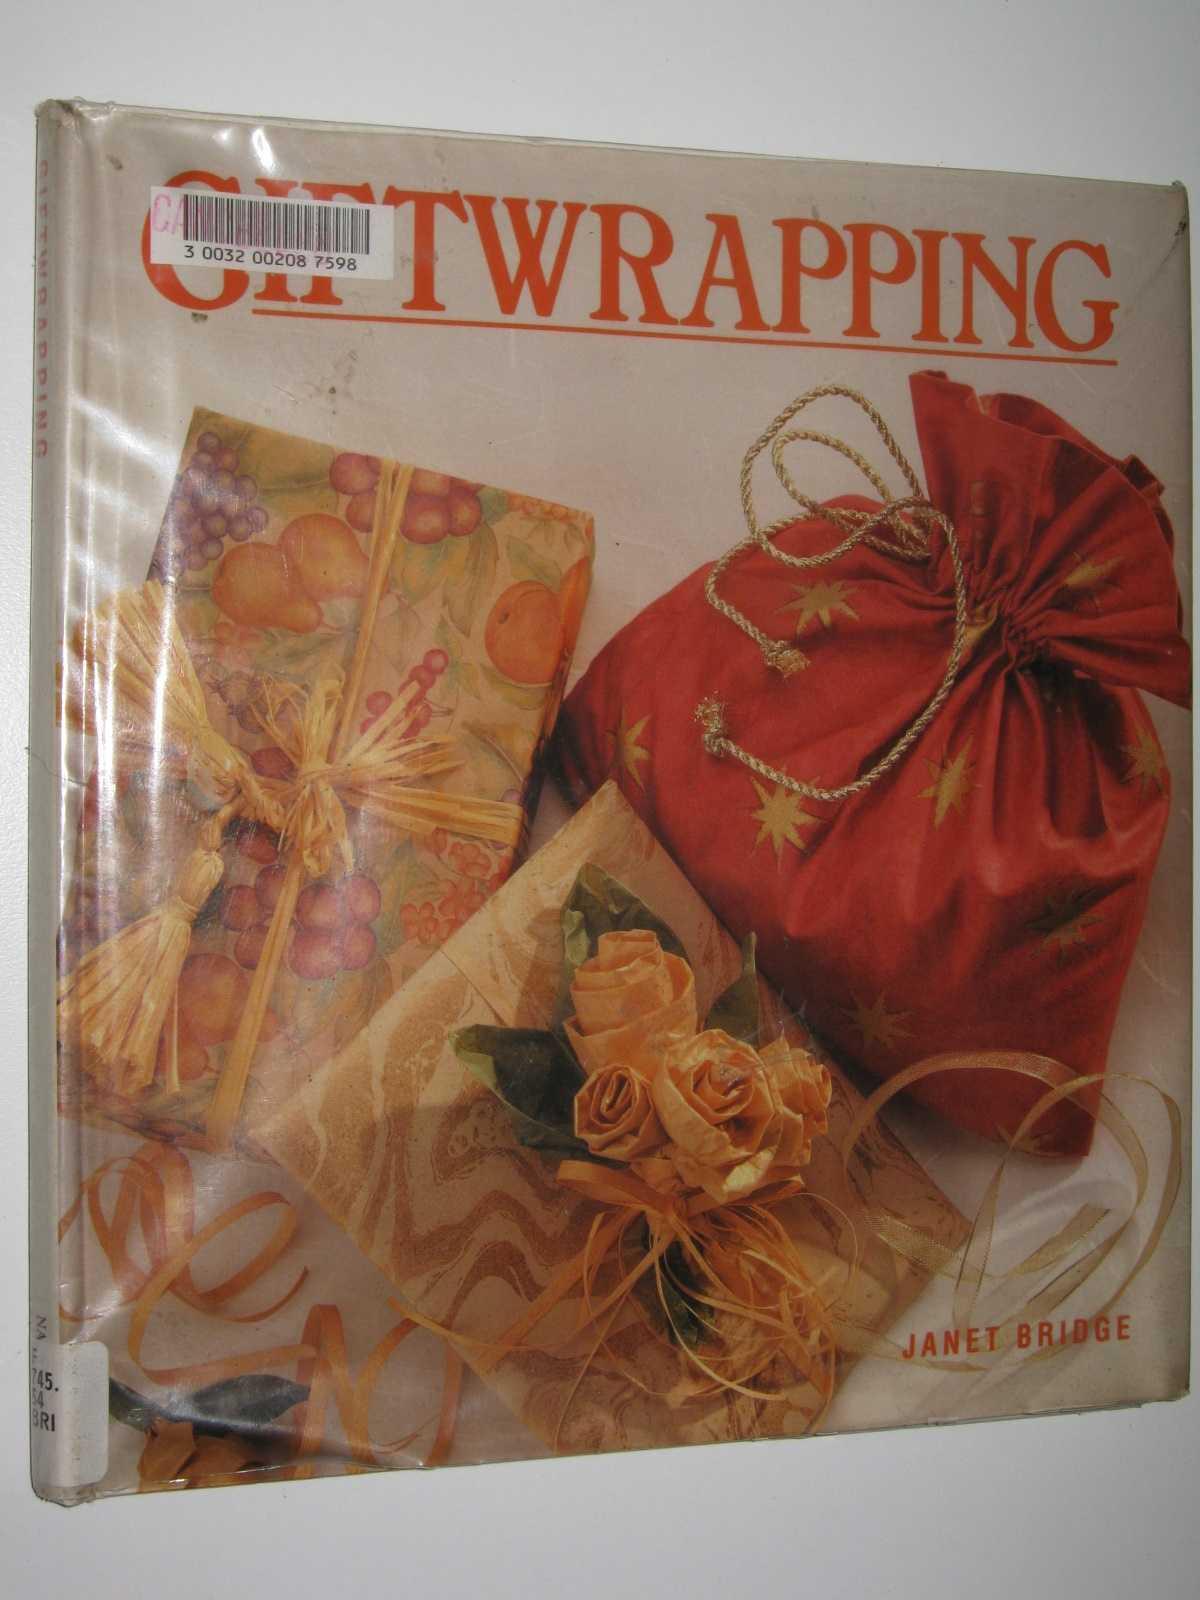 Giftwrapping, Bridge, Janet